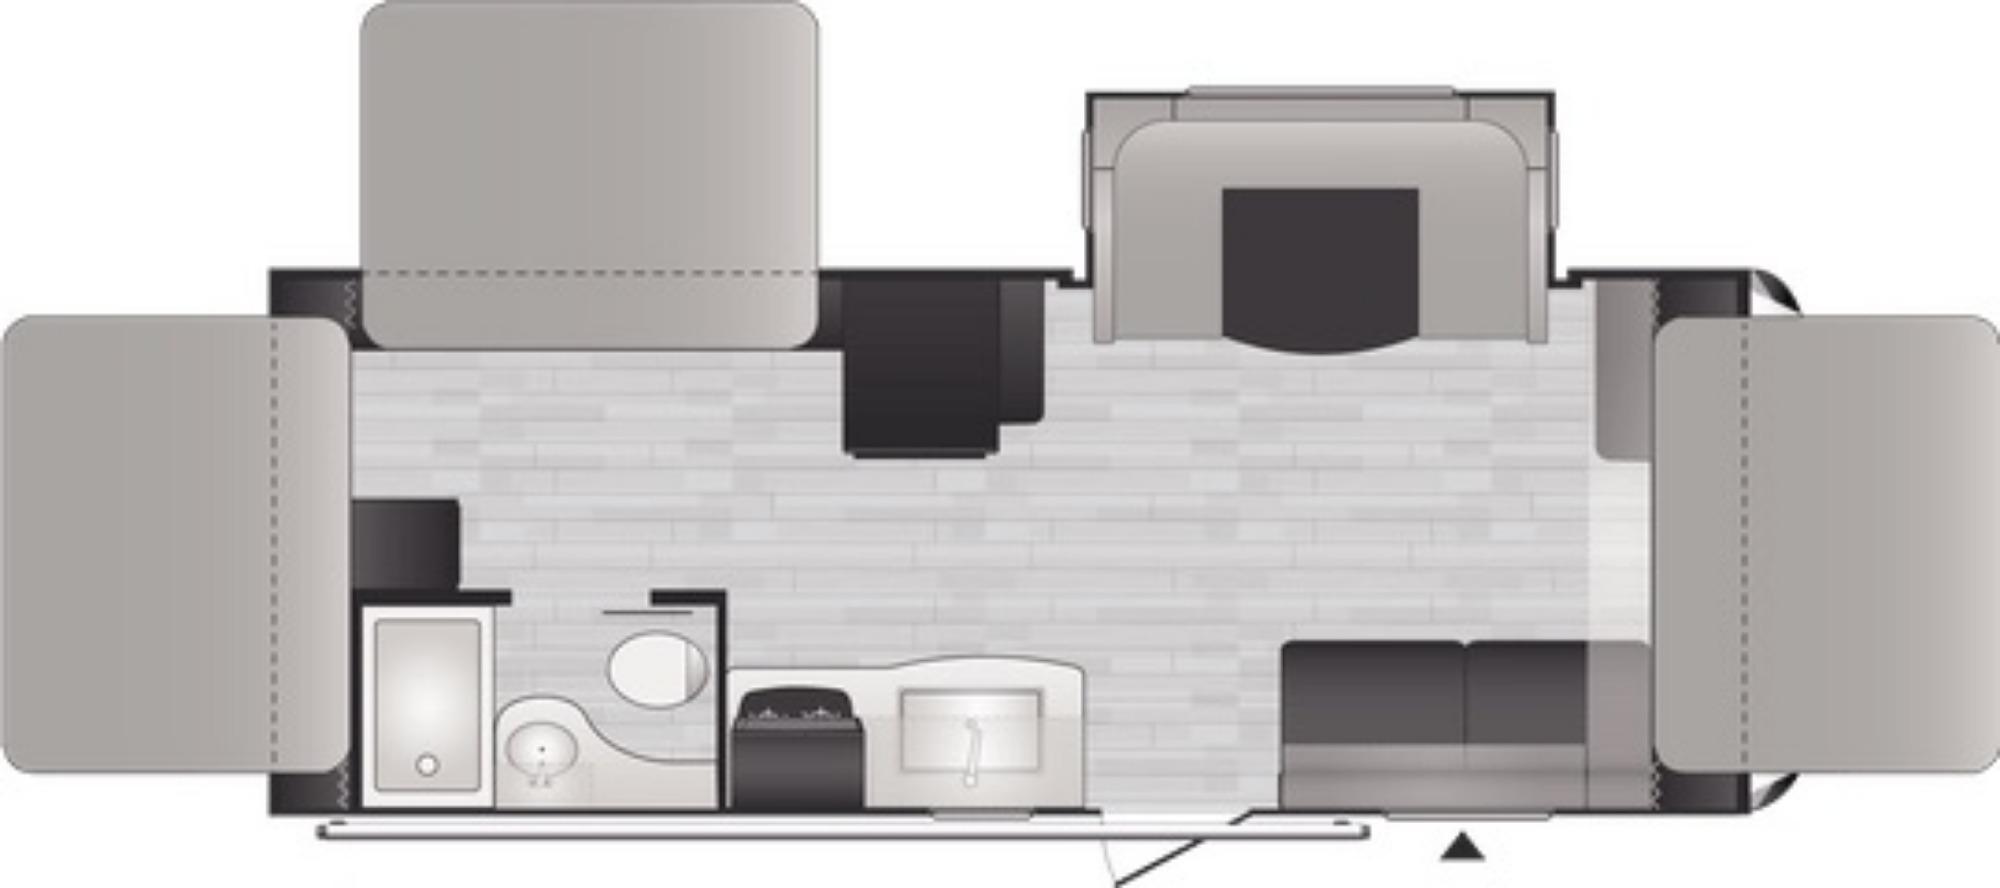 View Floor Plan for 2021 KEYSTONE BULLET CROSSFIRE 2190EX